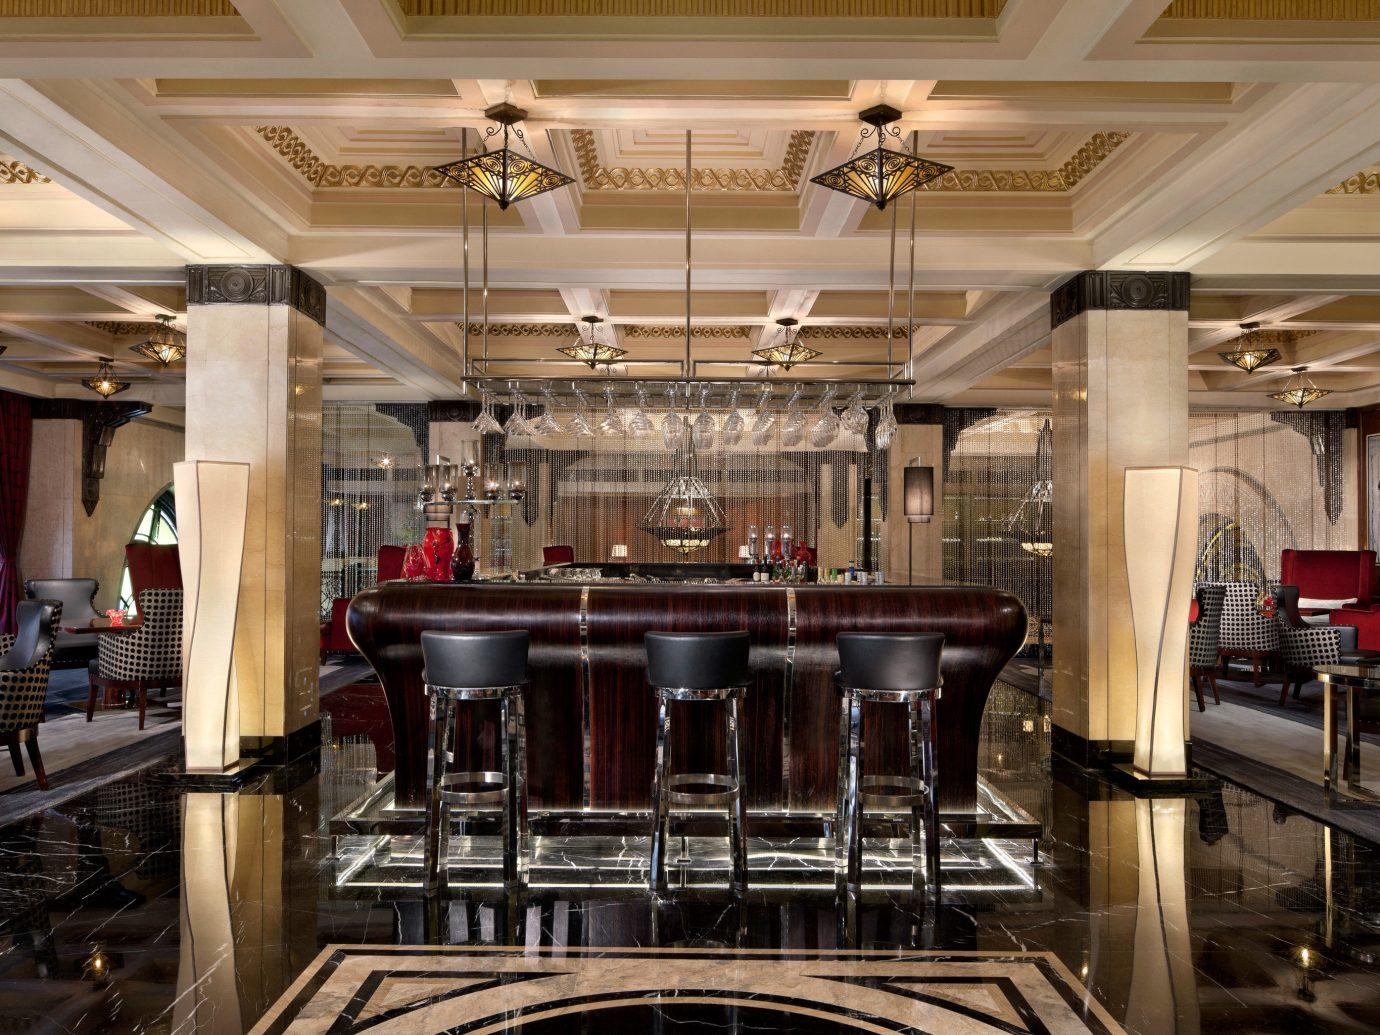 Bar Dining Drink Eat Elegant Hotels Luxury indoor ceiling table Kitchen Lobby function hall meal restaurant interior design ballroom convention center auditorium area steel several dining room